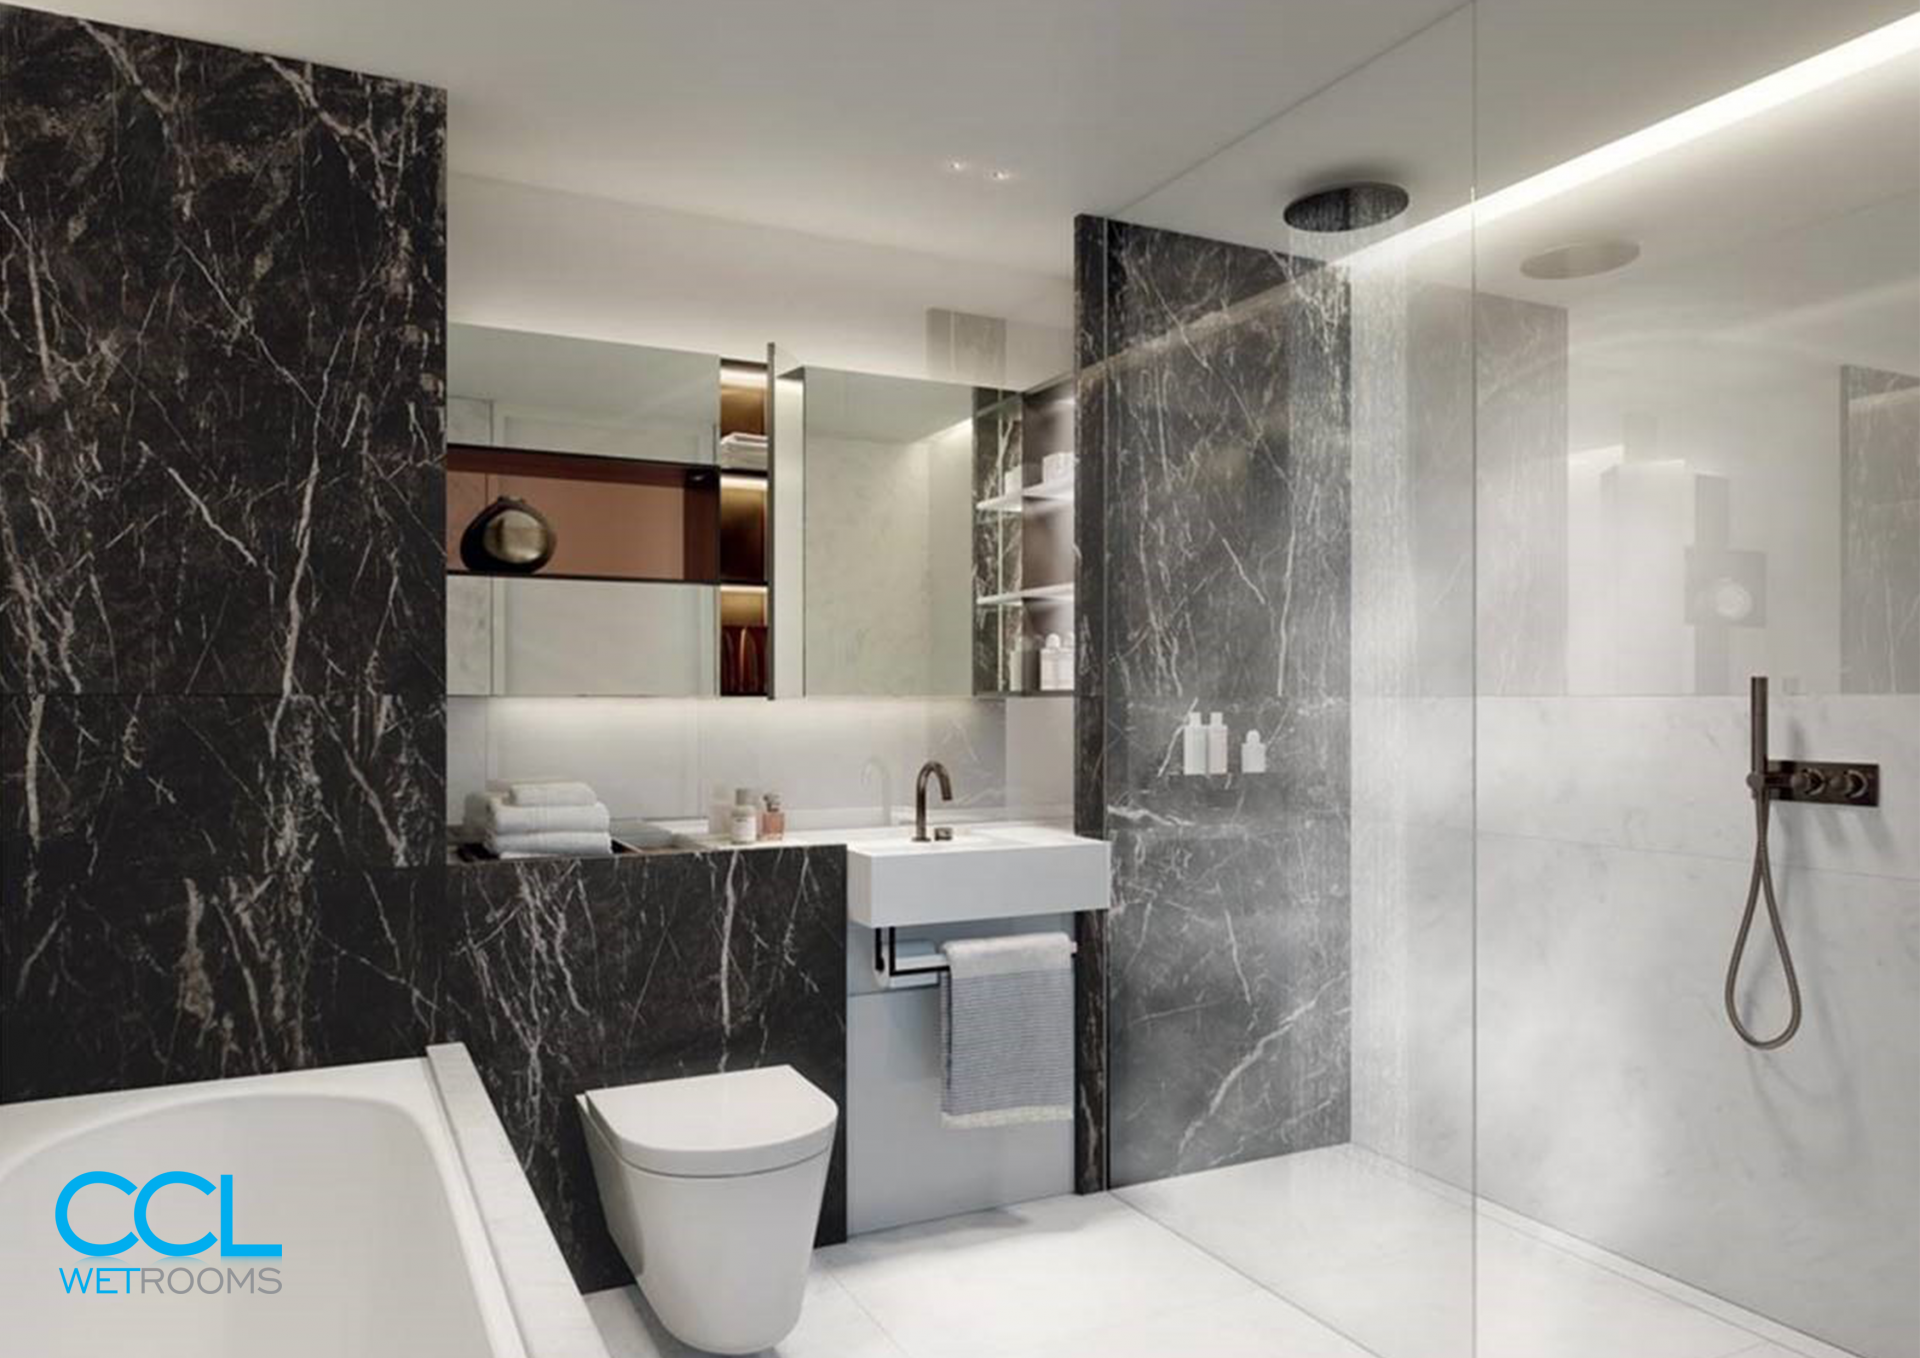 Luxury En Suite Wetrooms